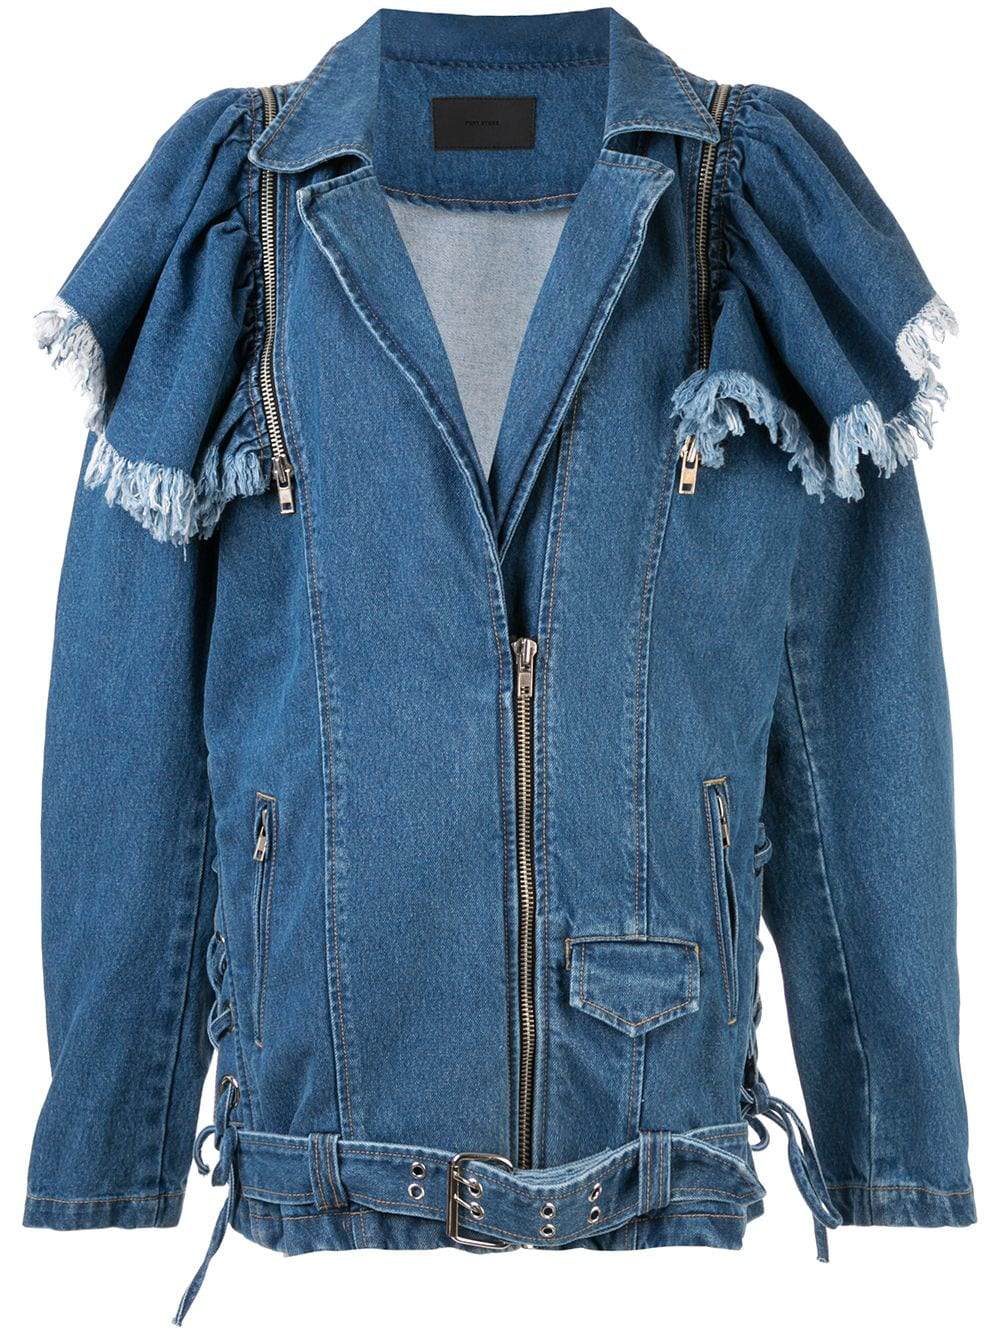 98d4994ccf Pony Stone Maggie Oversized Denim Jacket - Blue